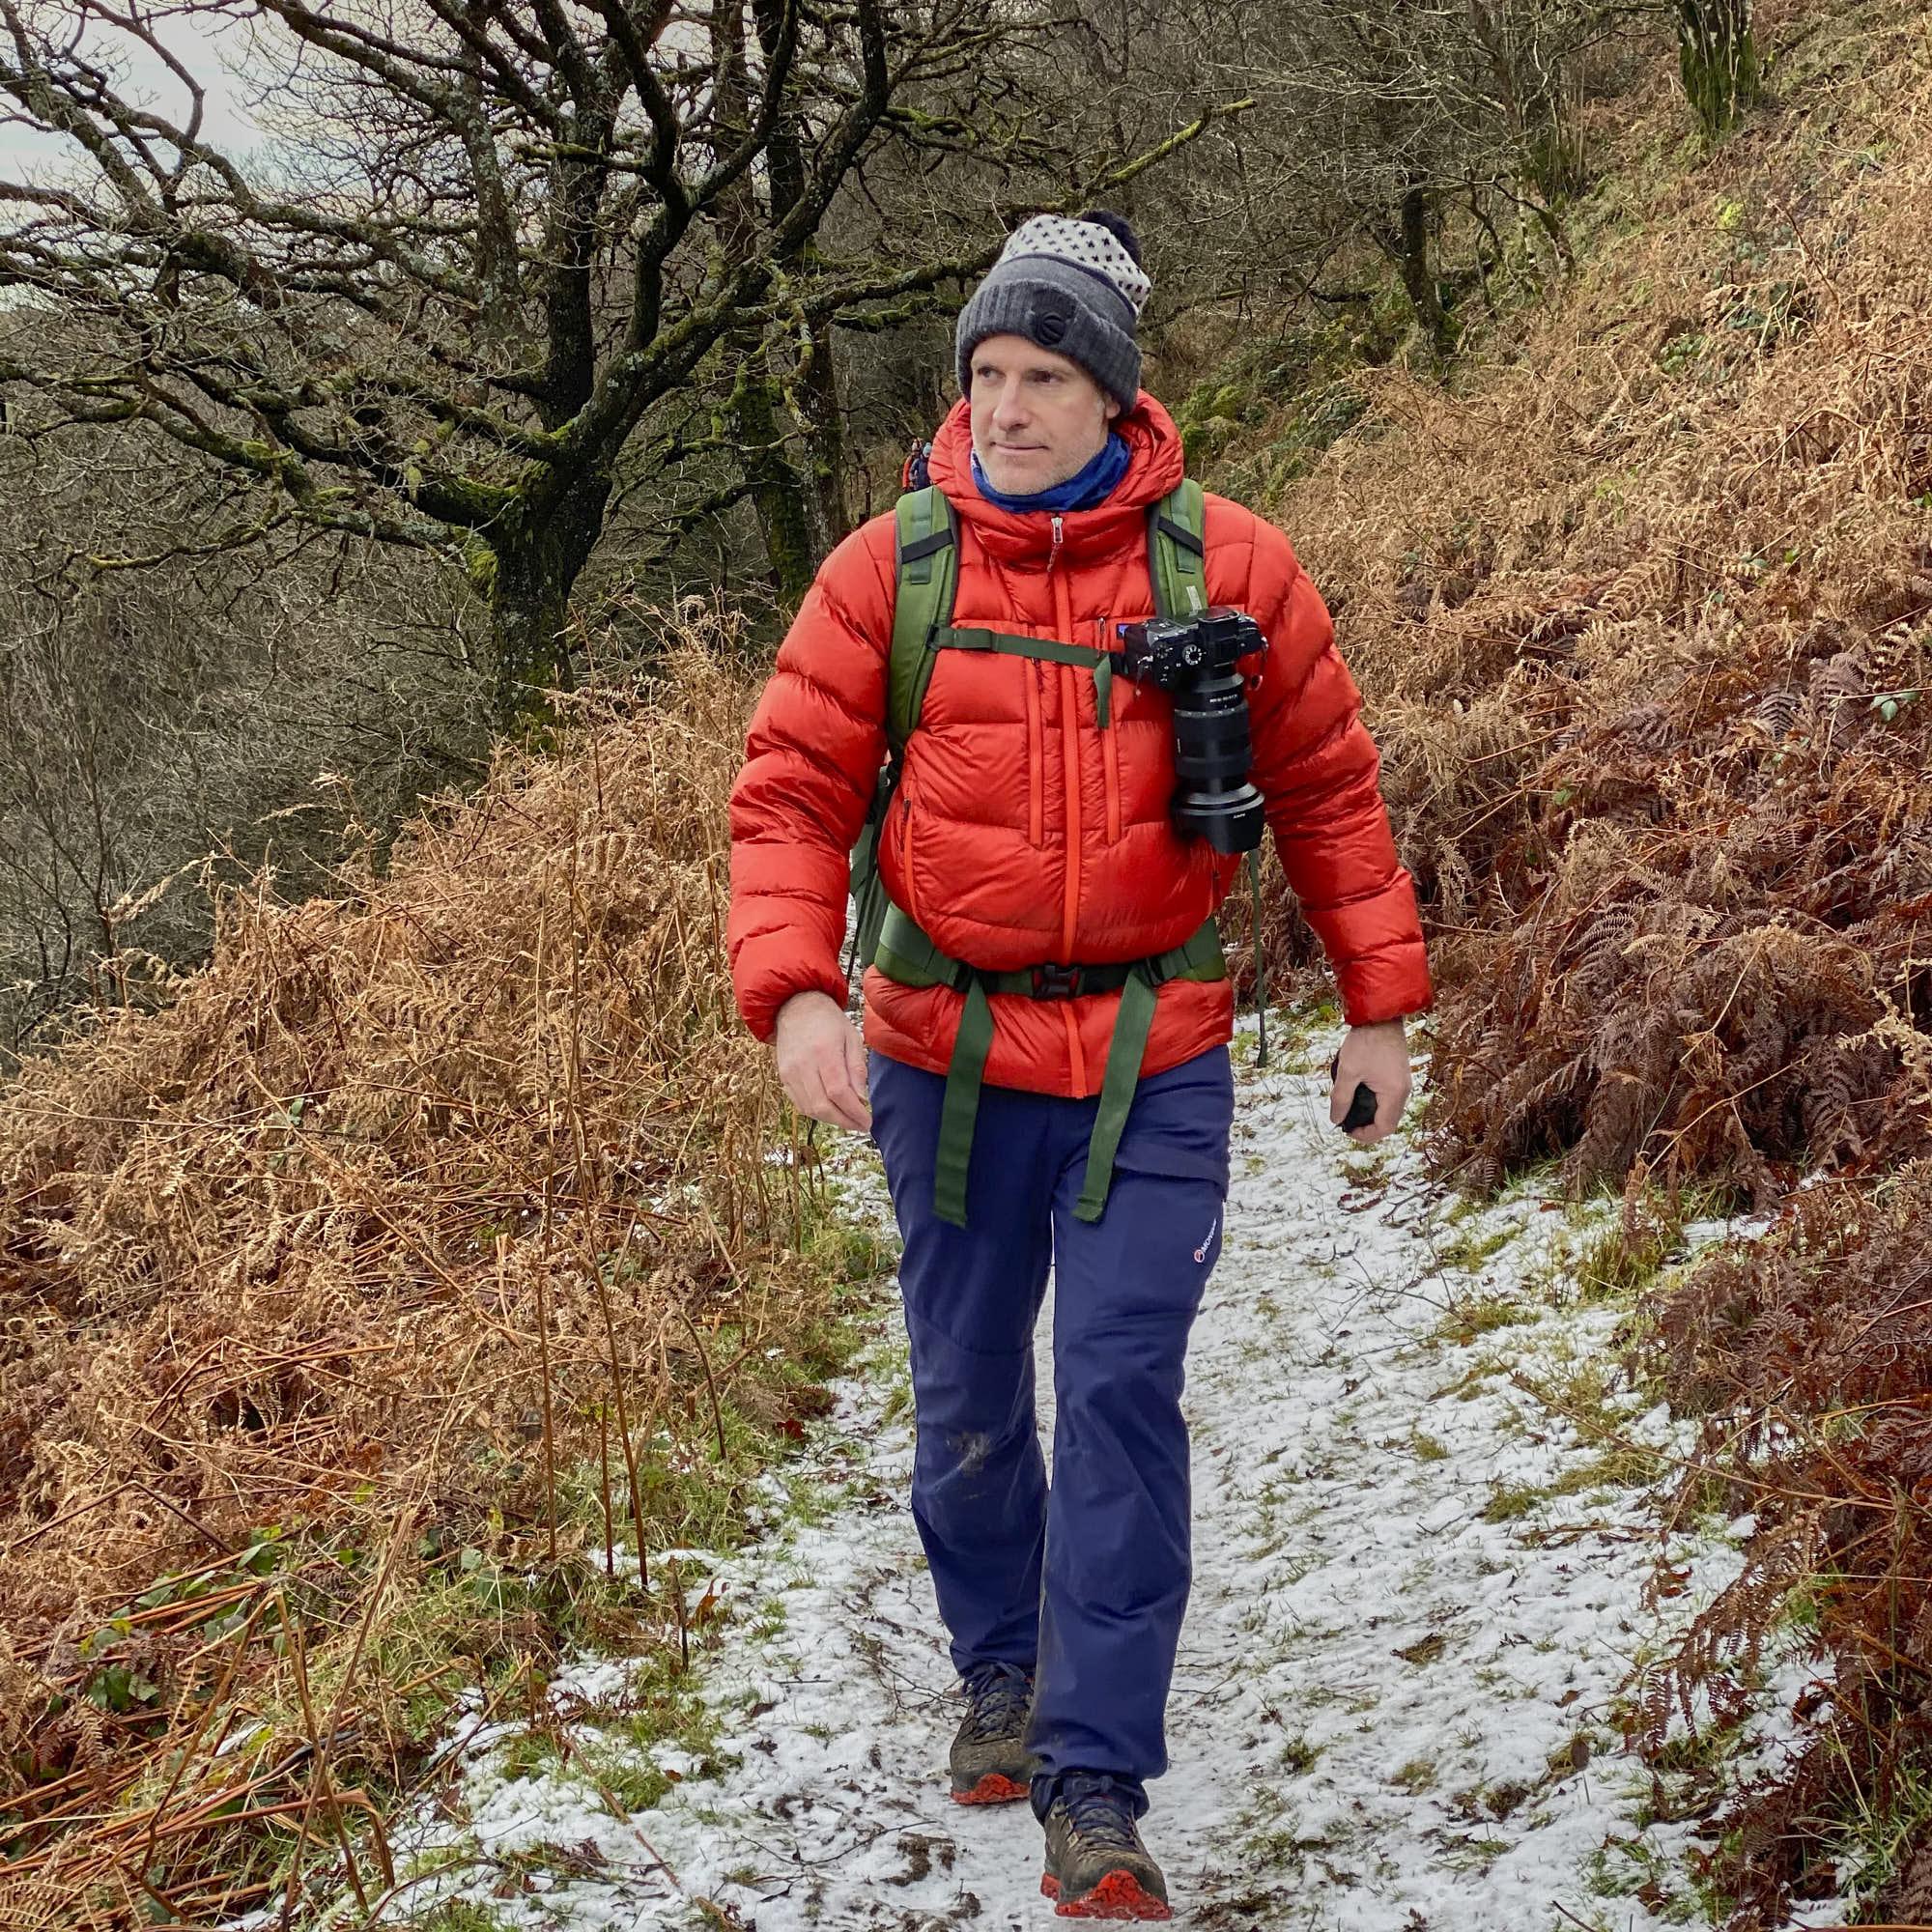 Matt Ray hiking a frozen Dartmoor wearing the Patagonia Fitz Roy Down Hoodie